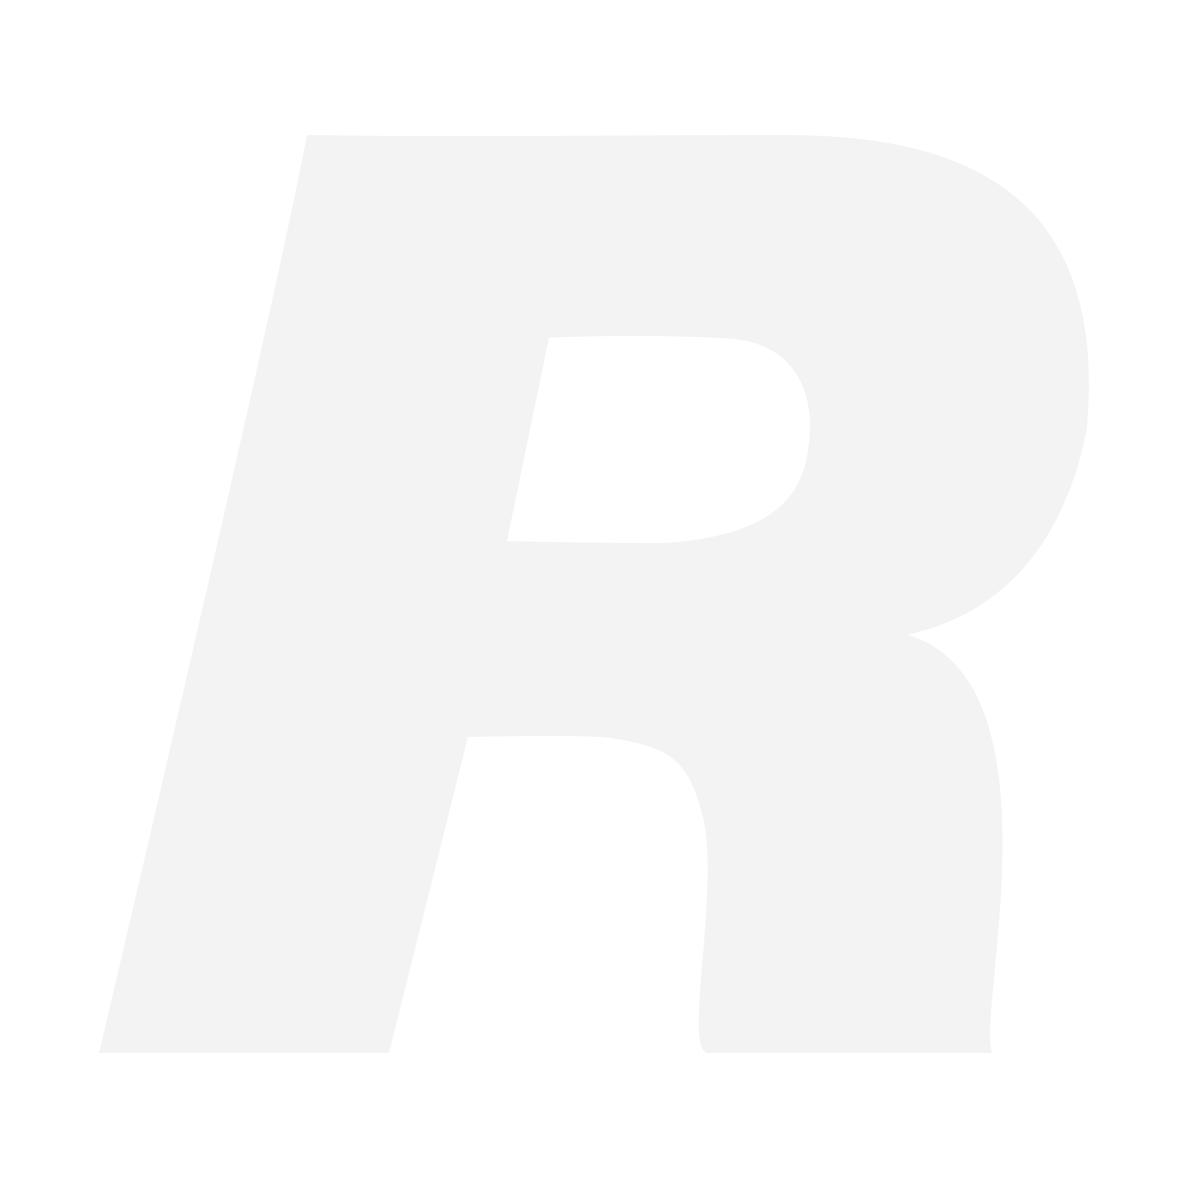 FUJIFILM X-T2 + BATTERIGREPP BEGAGNAD